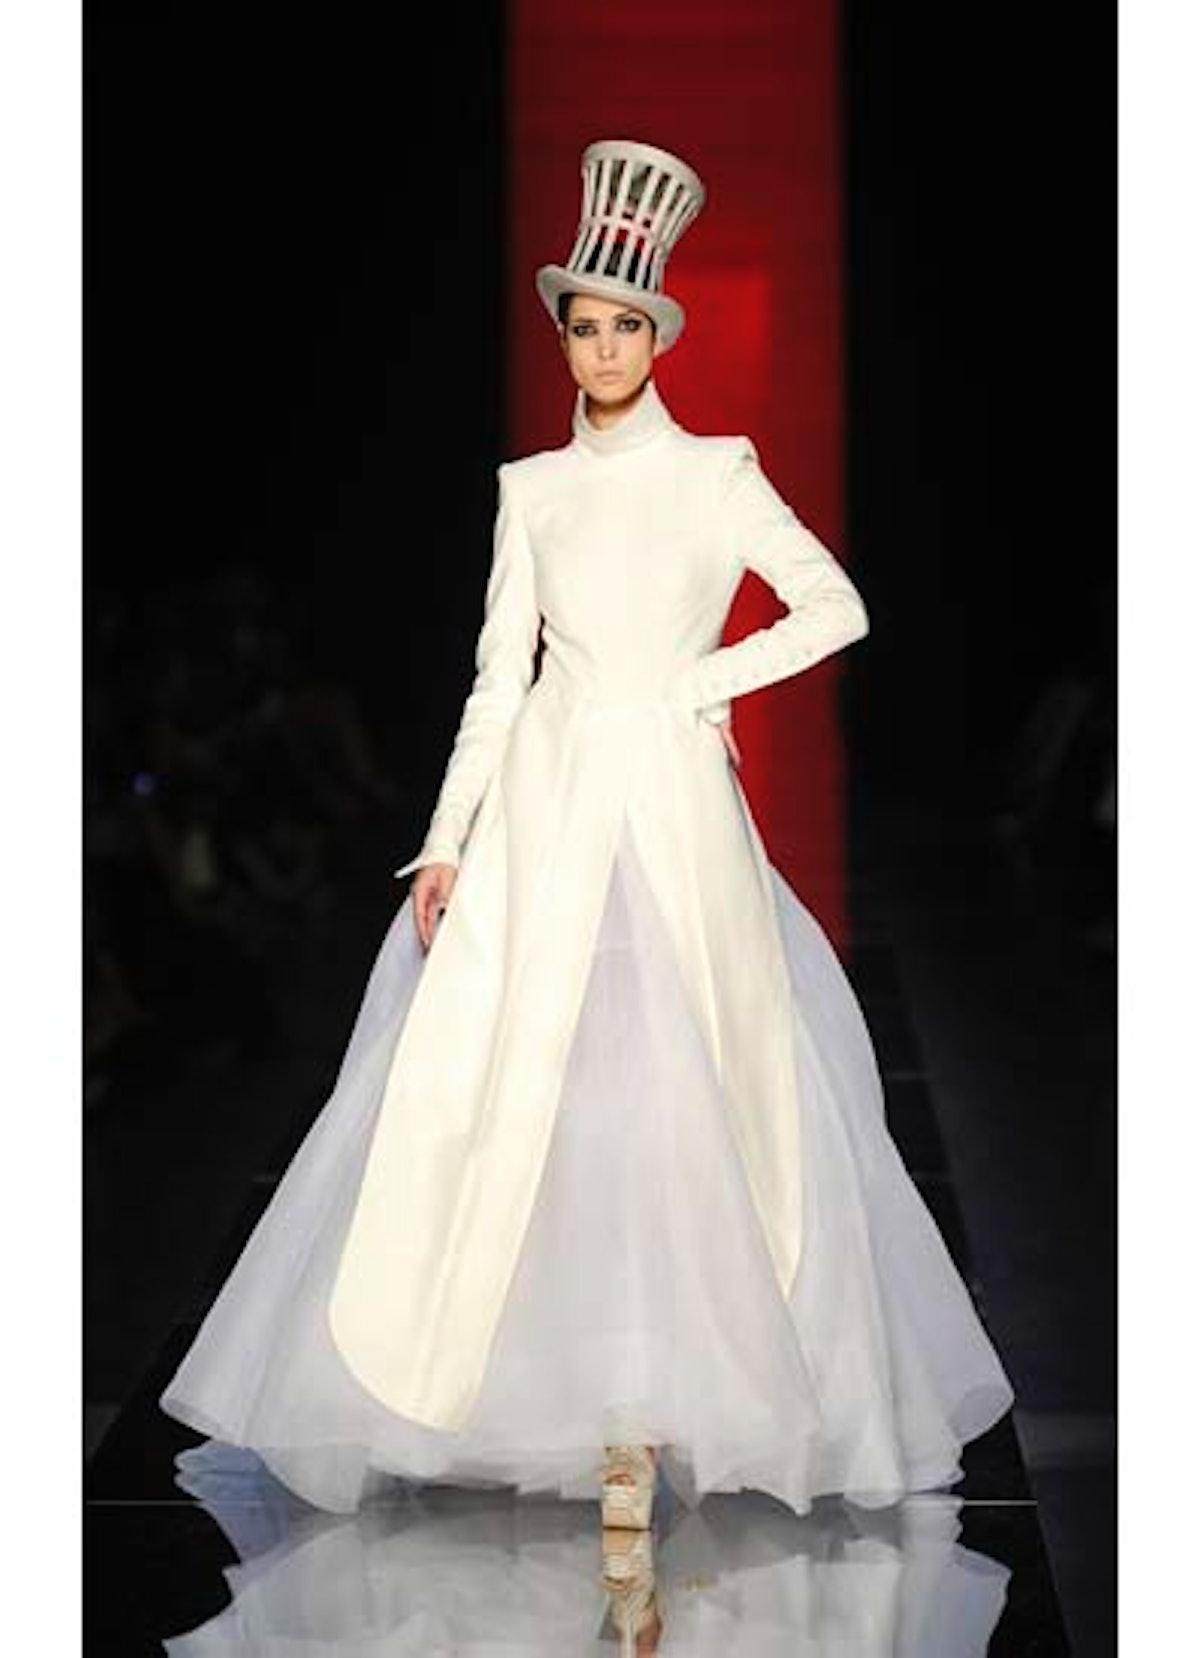 fass-jean-paul-gaultier-couture-2012-runway-58-v.jpg